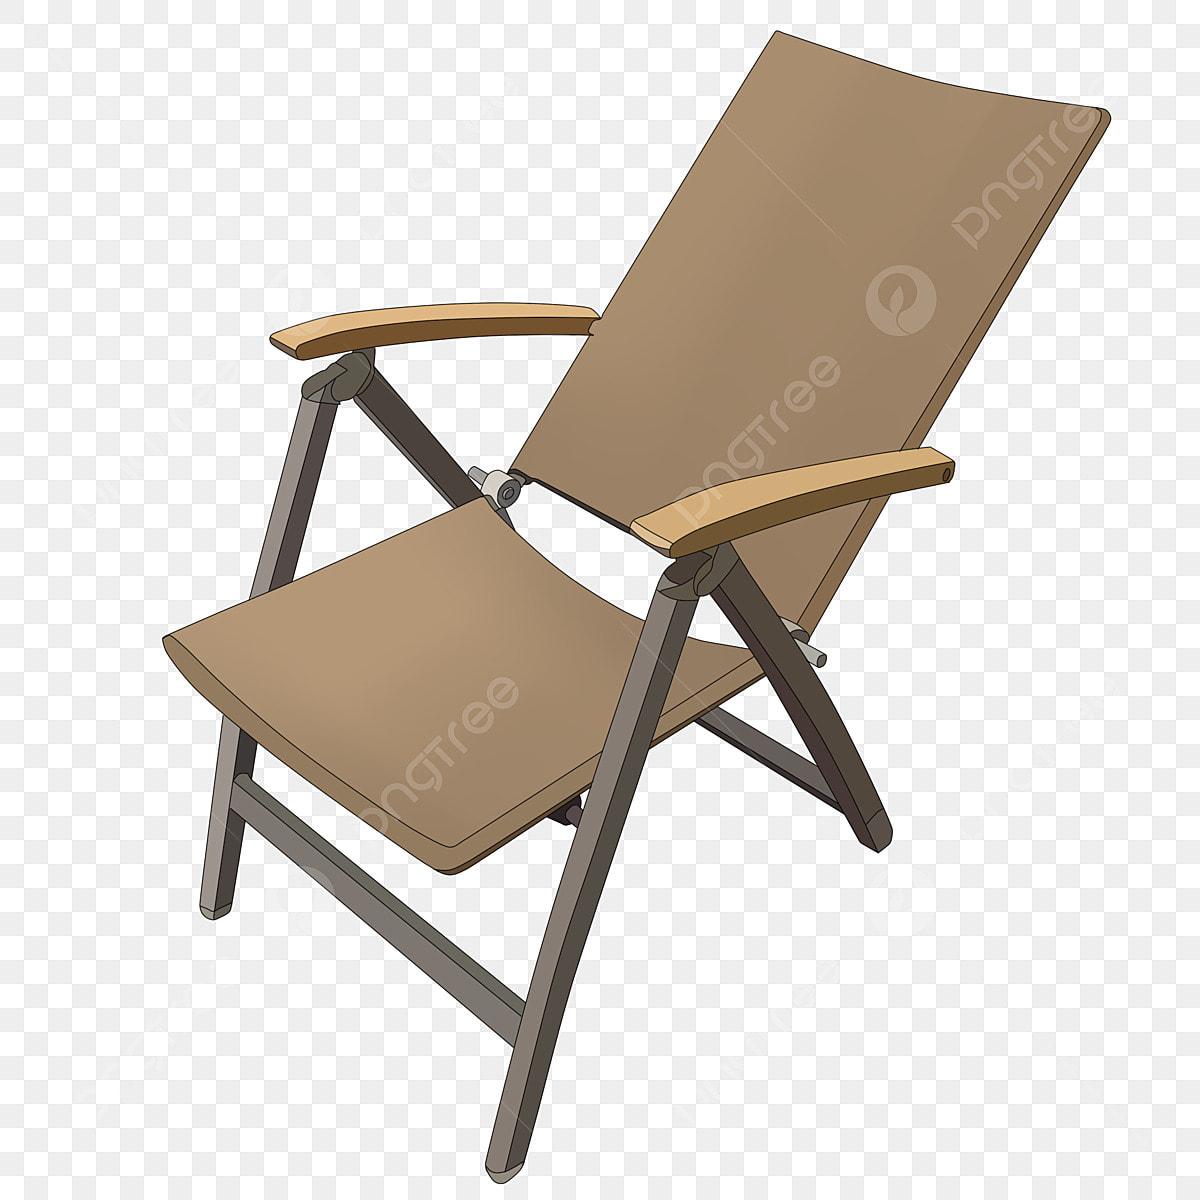 Comfortable Recliner Cartoon Furniture Furniture Chairs